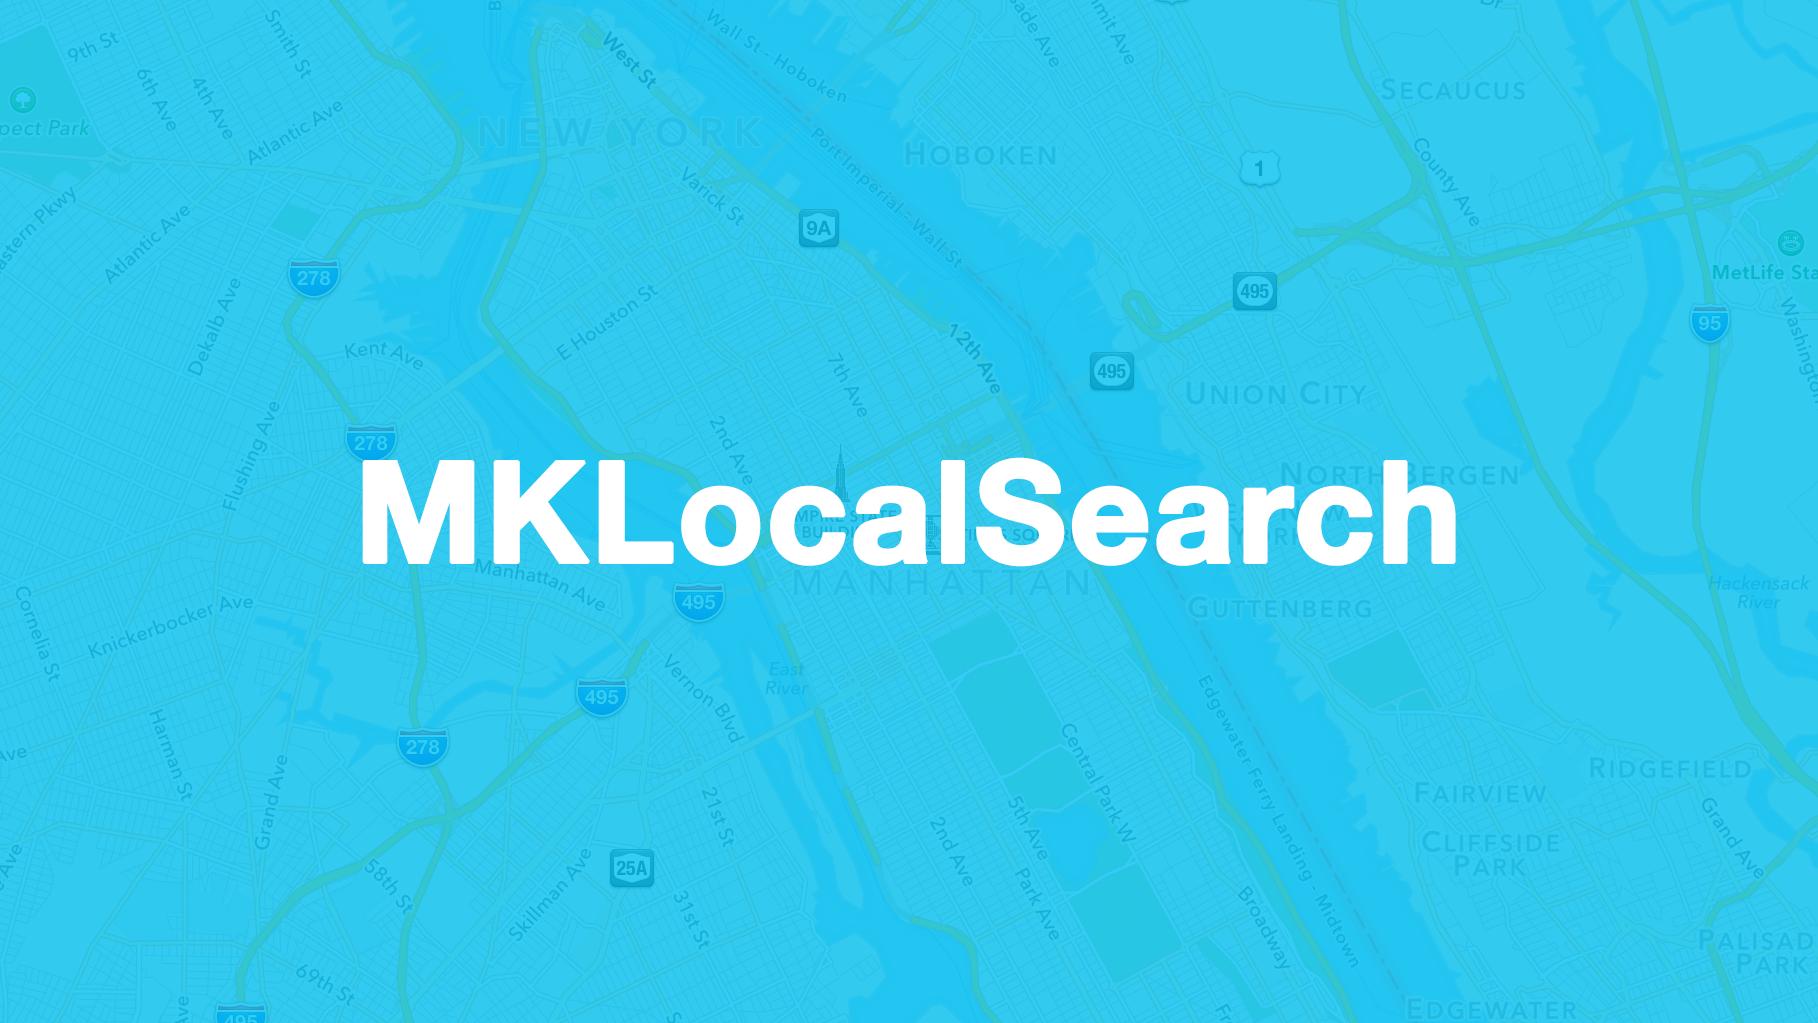 Swift Quick Tip: Using Apple MapKit's MKLocalSearch